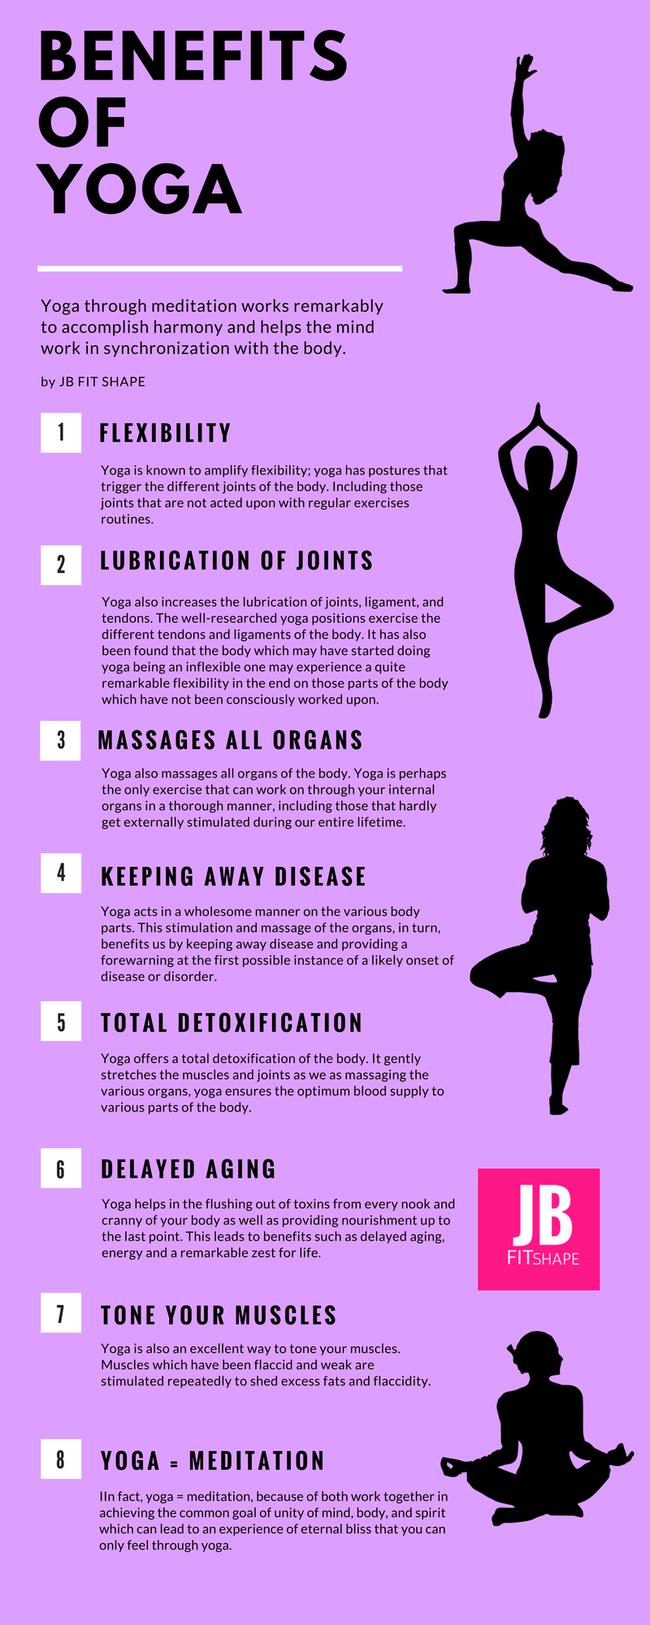 Benefits Of Yoga Yoga Benefits Meditation Yoga Poses Health Fitness Yoga For Beginners Boost Meta Yoga Benefits How To Do Yoga Yoga For Beginners